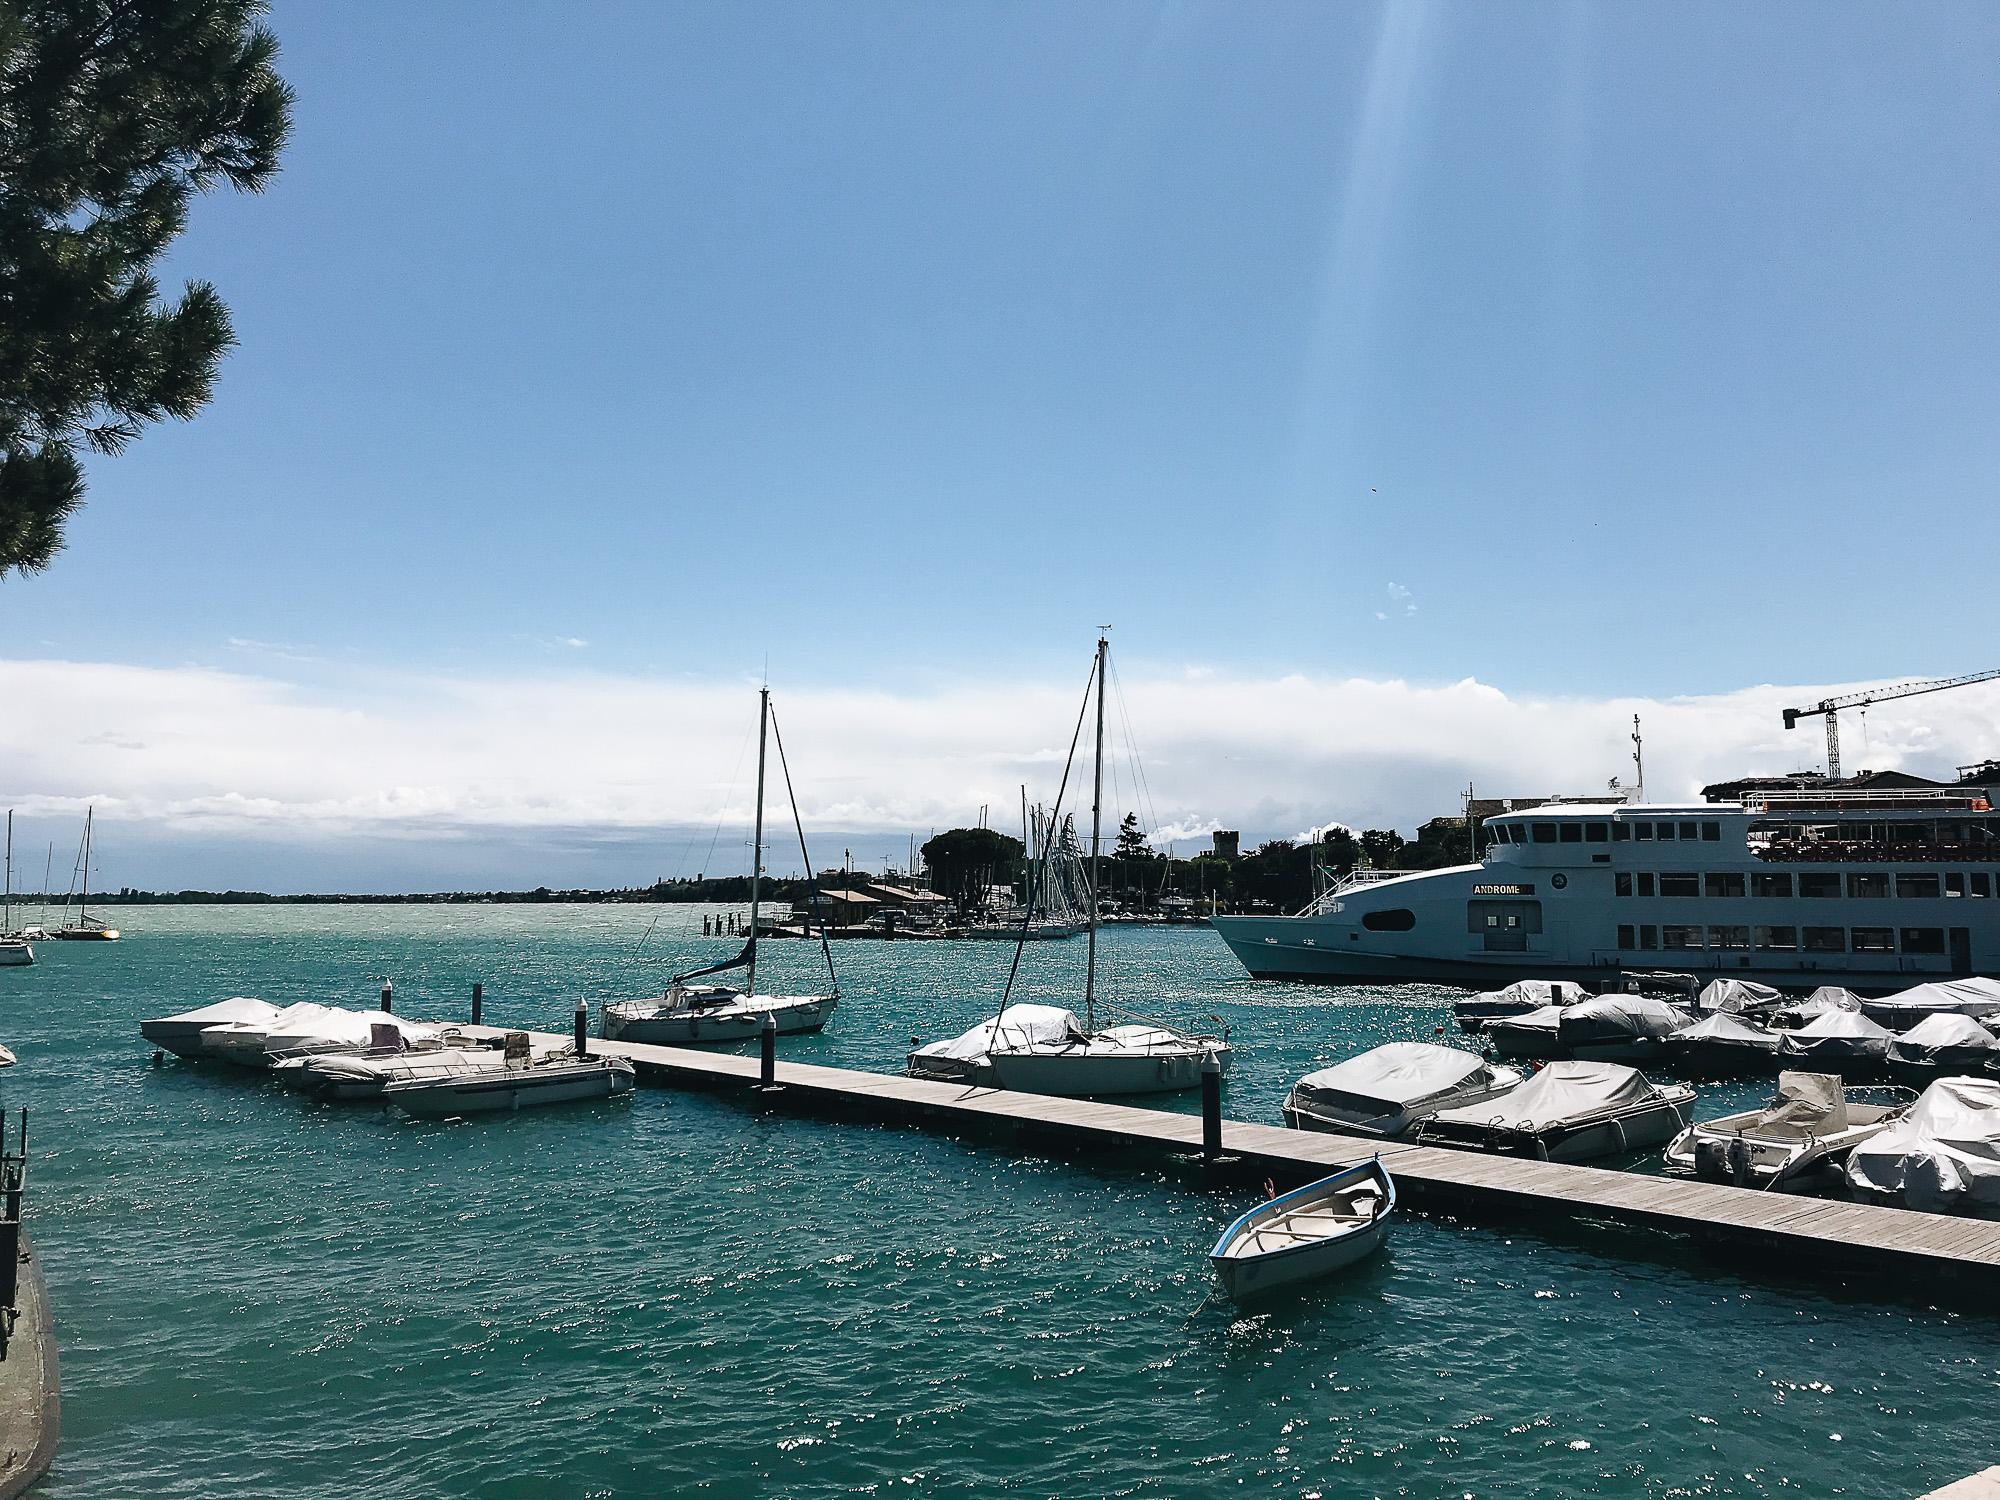 OurBeautifulAdventure-LakeGarda-Italy-Blog-6373.jpg